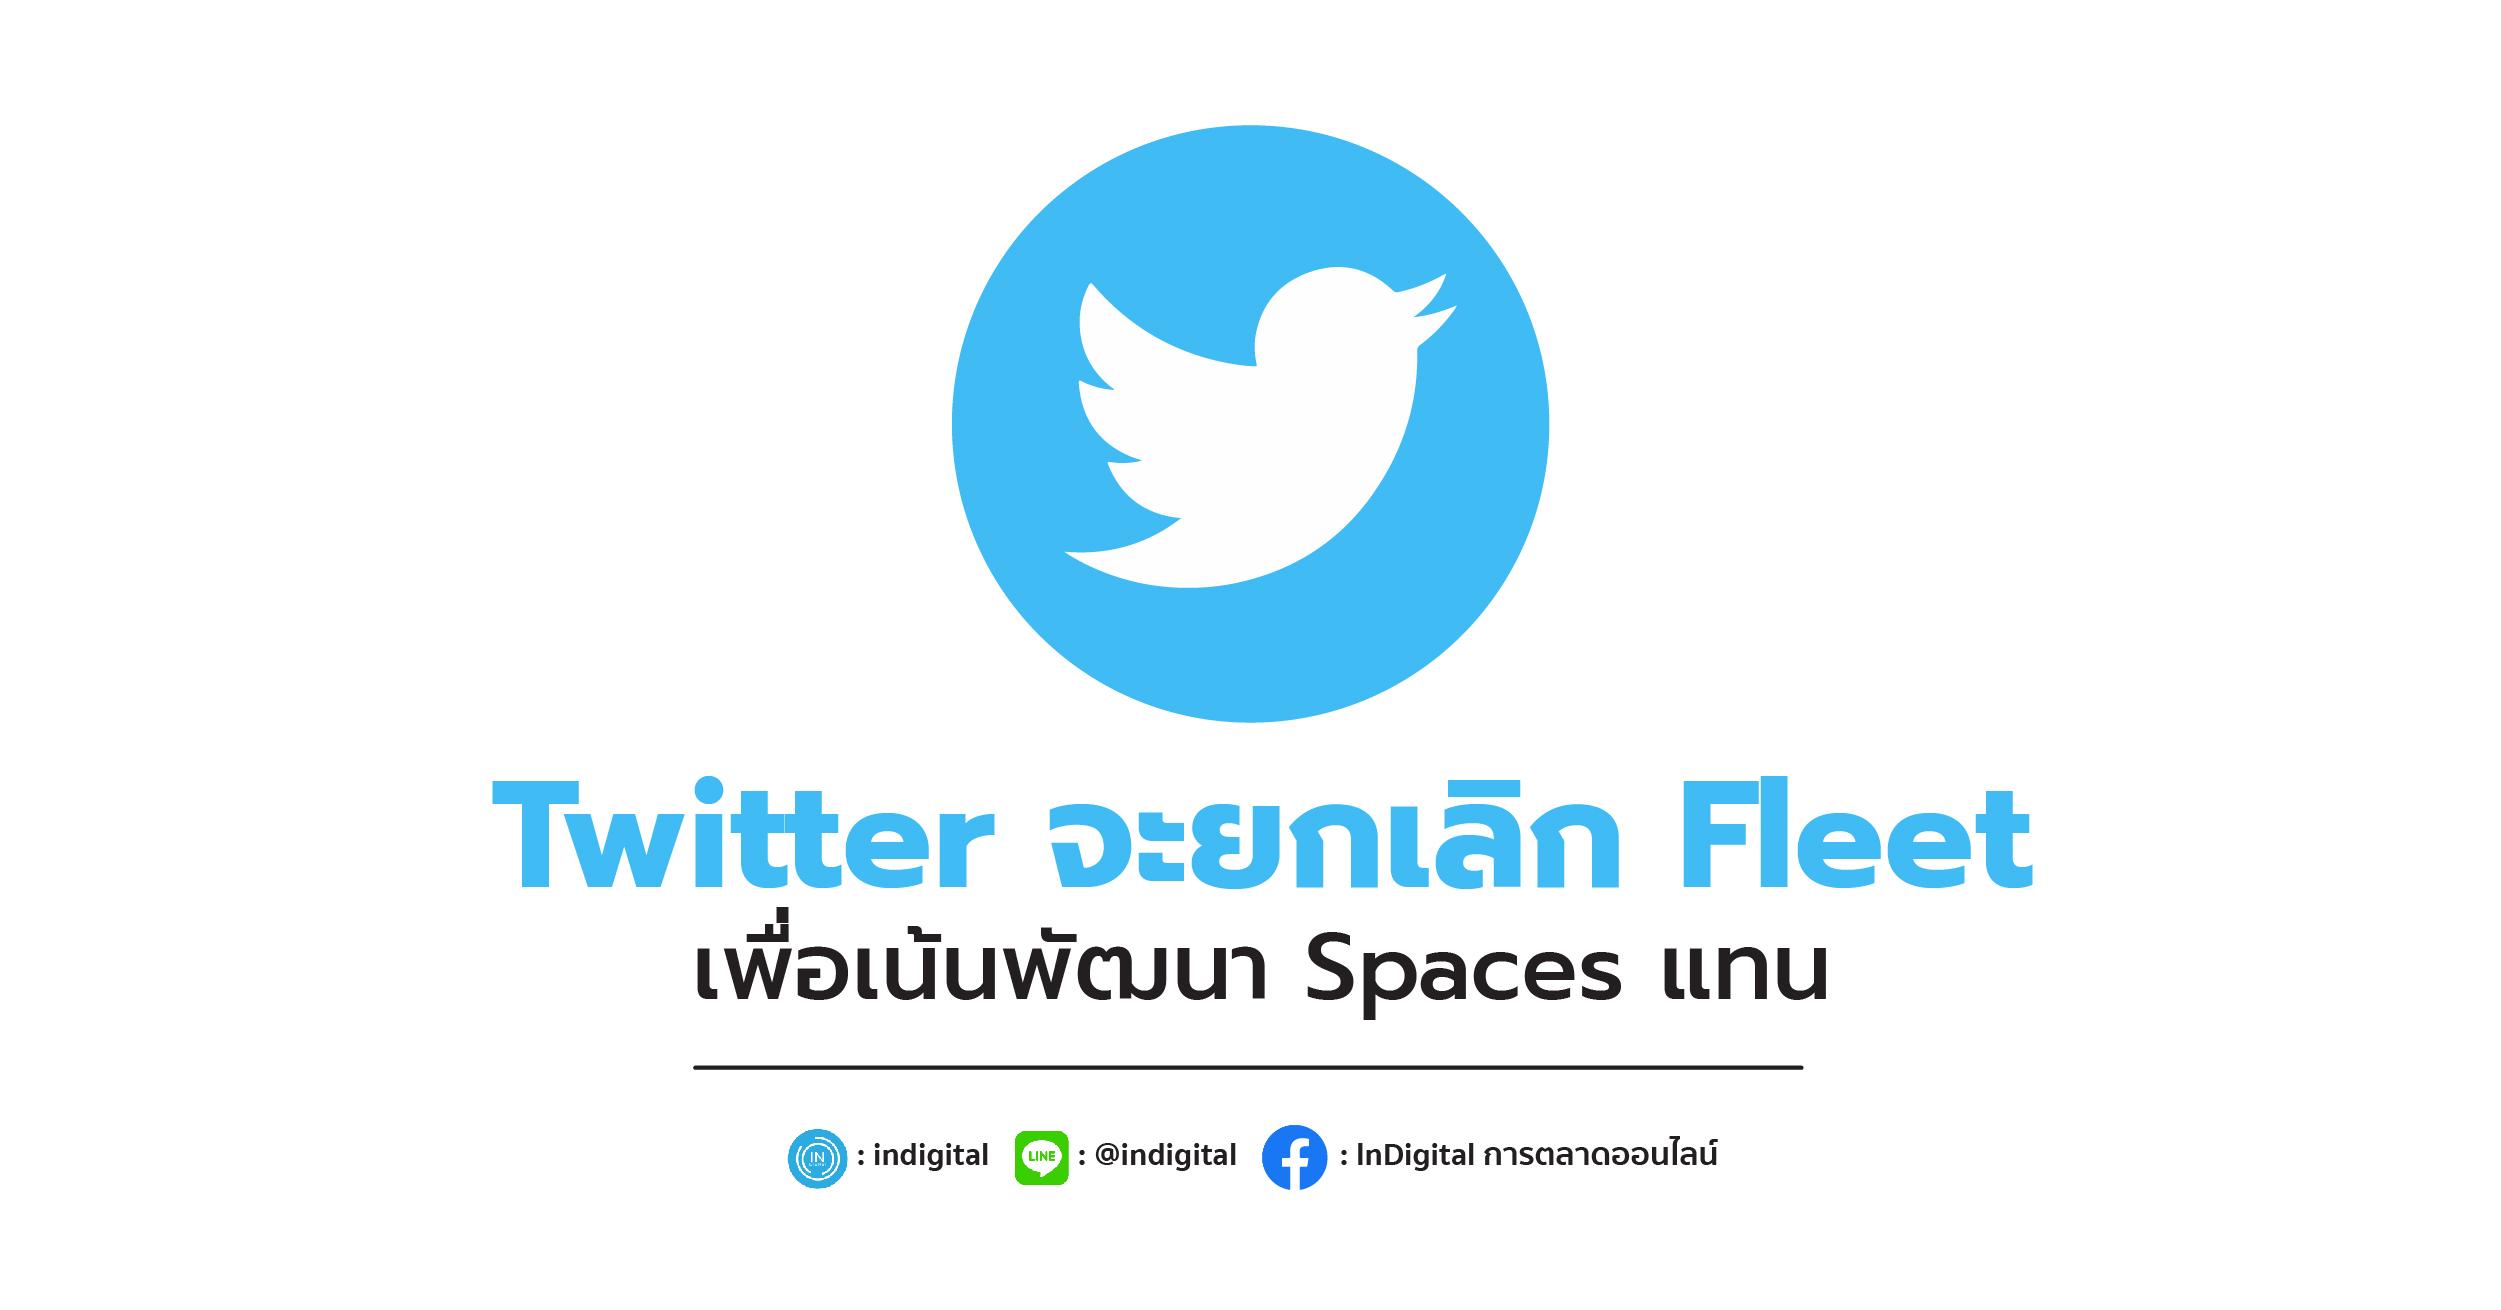 Twitter จะยกเลิก Fleet เพื่อเน้นพัฒนา Spaces แทน